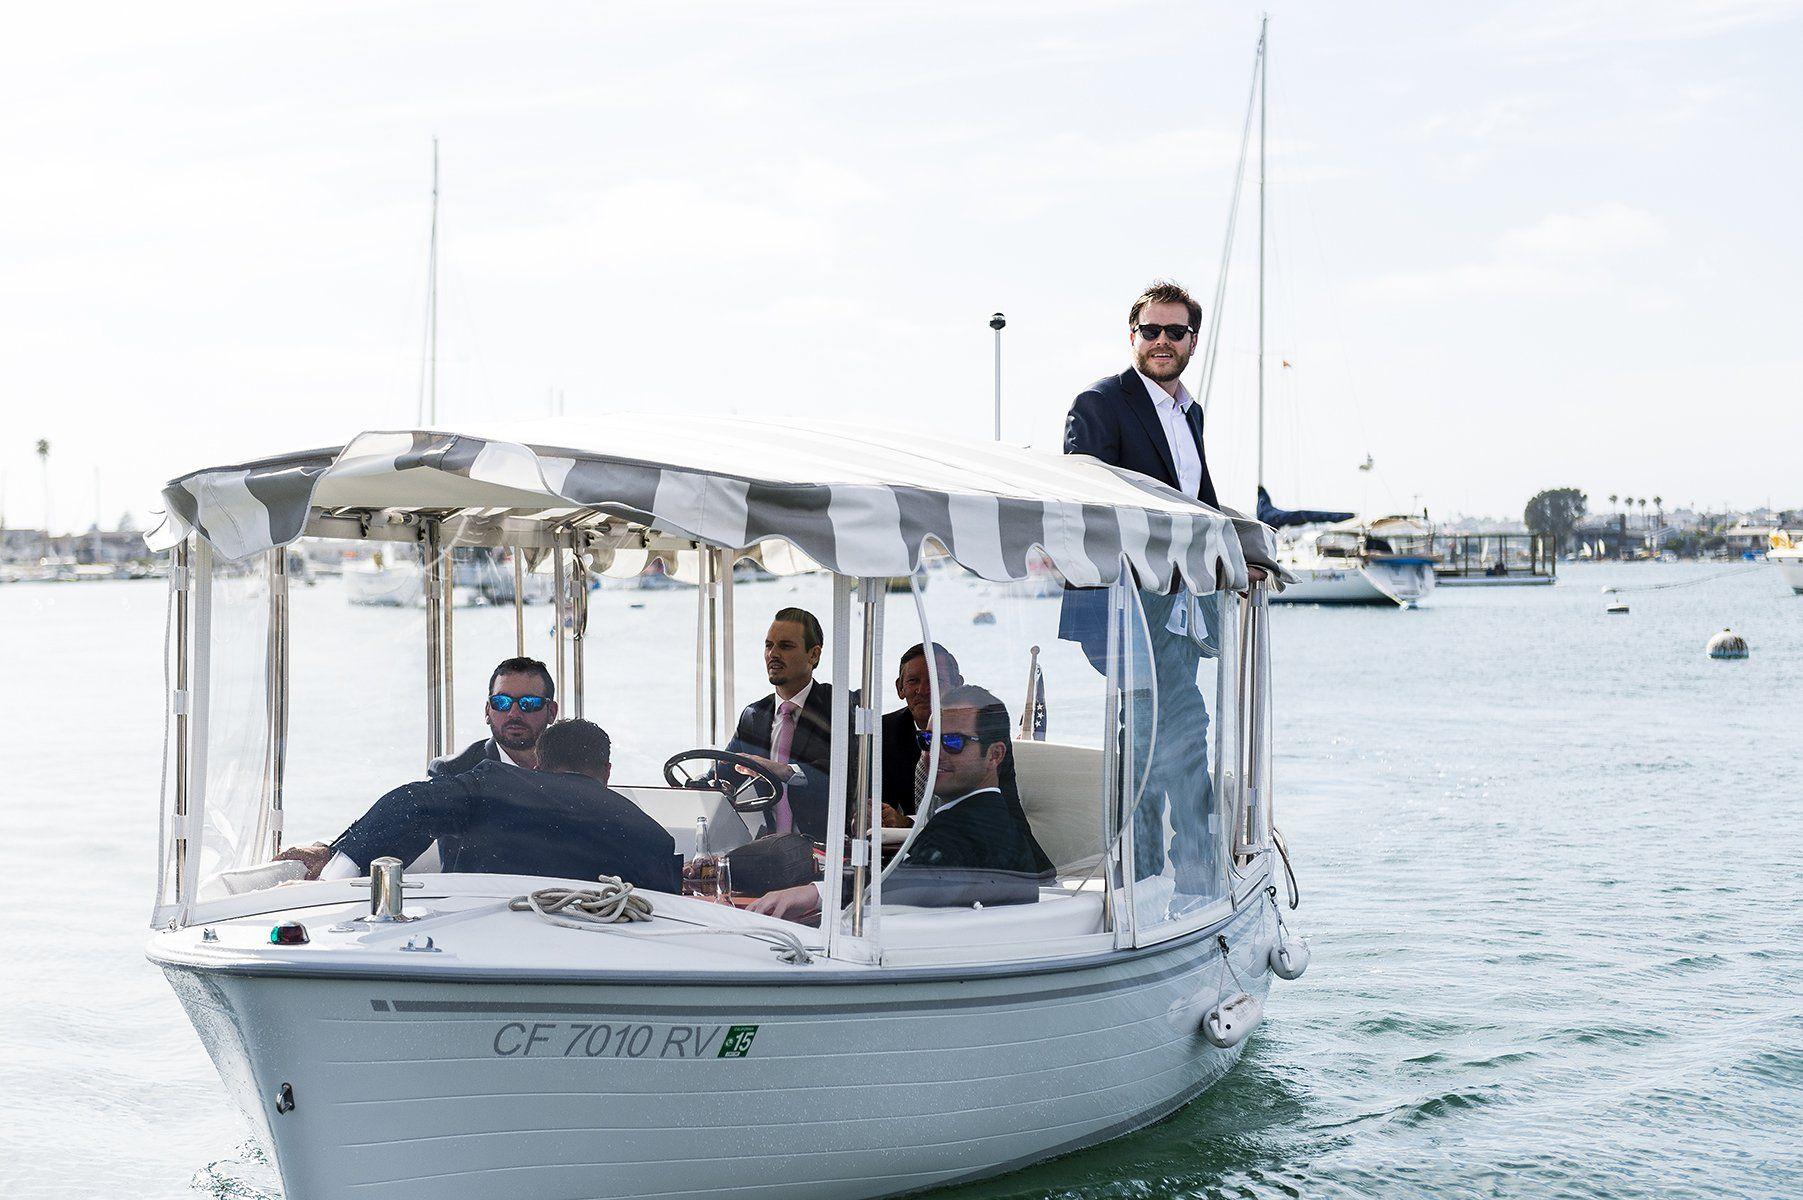 Boat Als Newport Beach Best On The World 2017